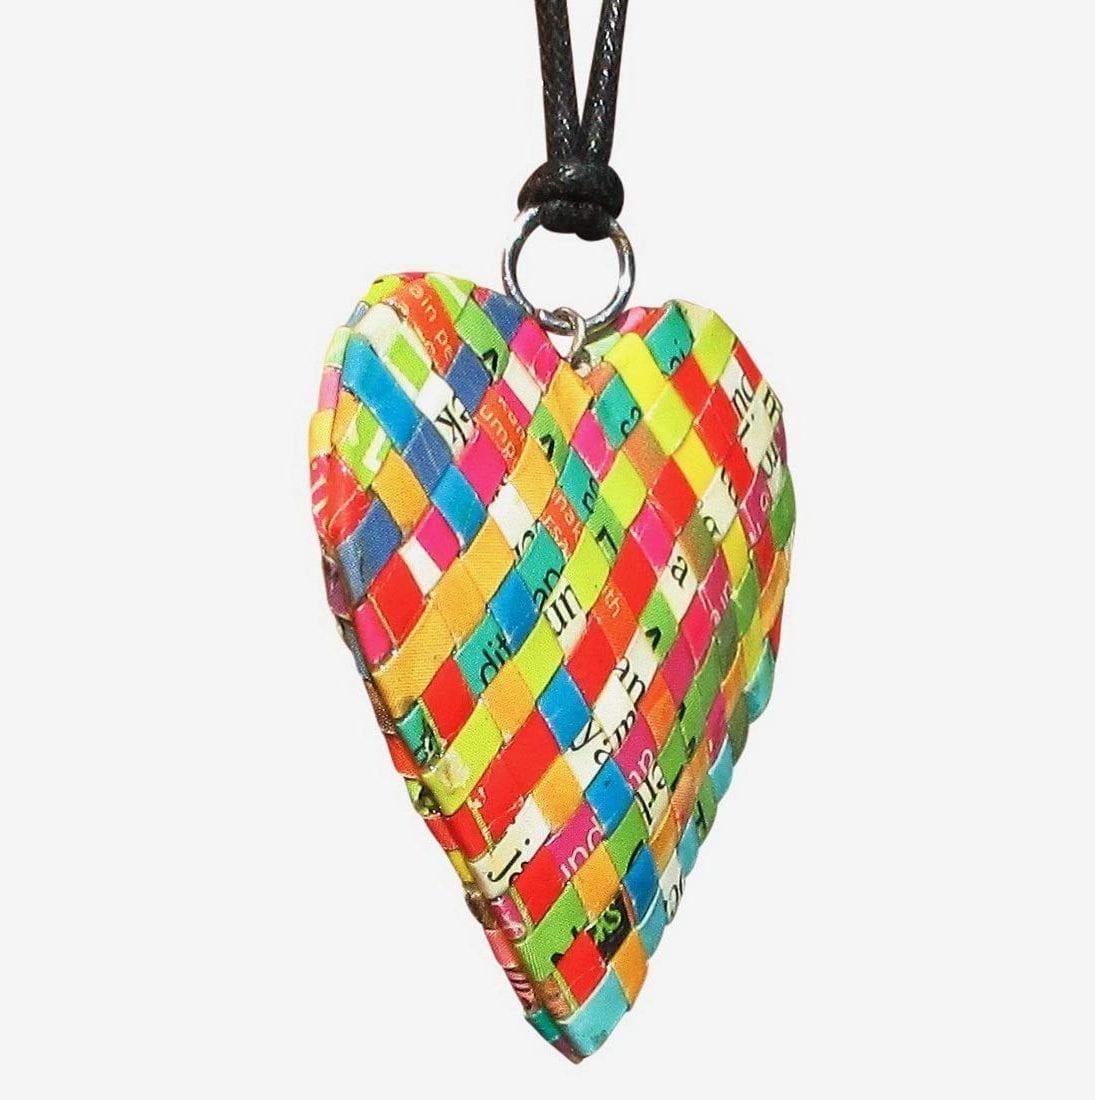 recycled magazine heart neckalce